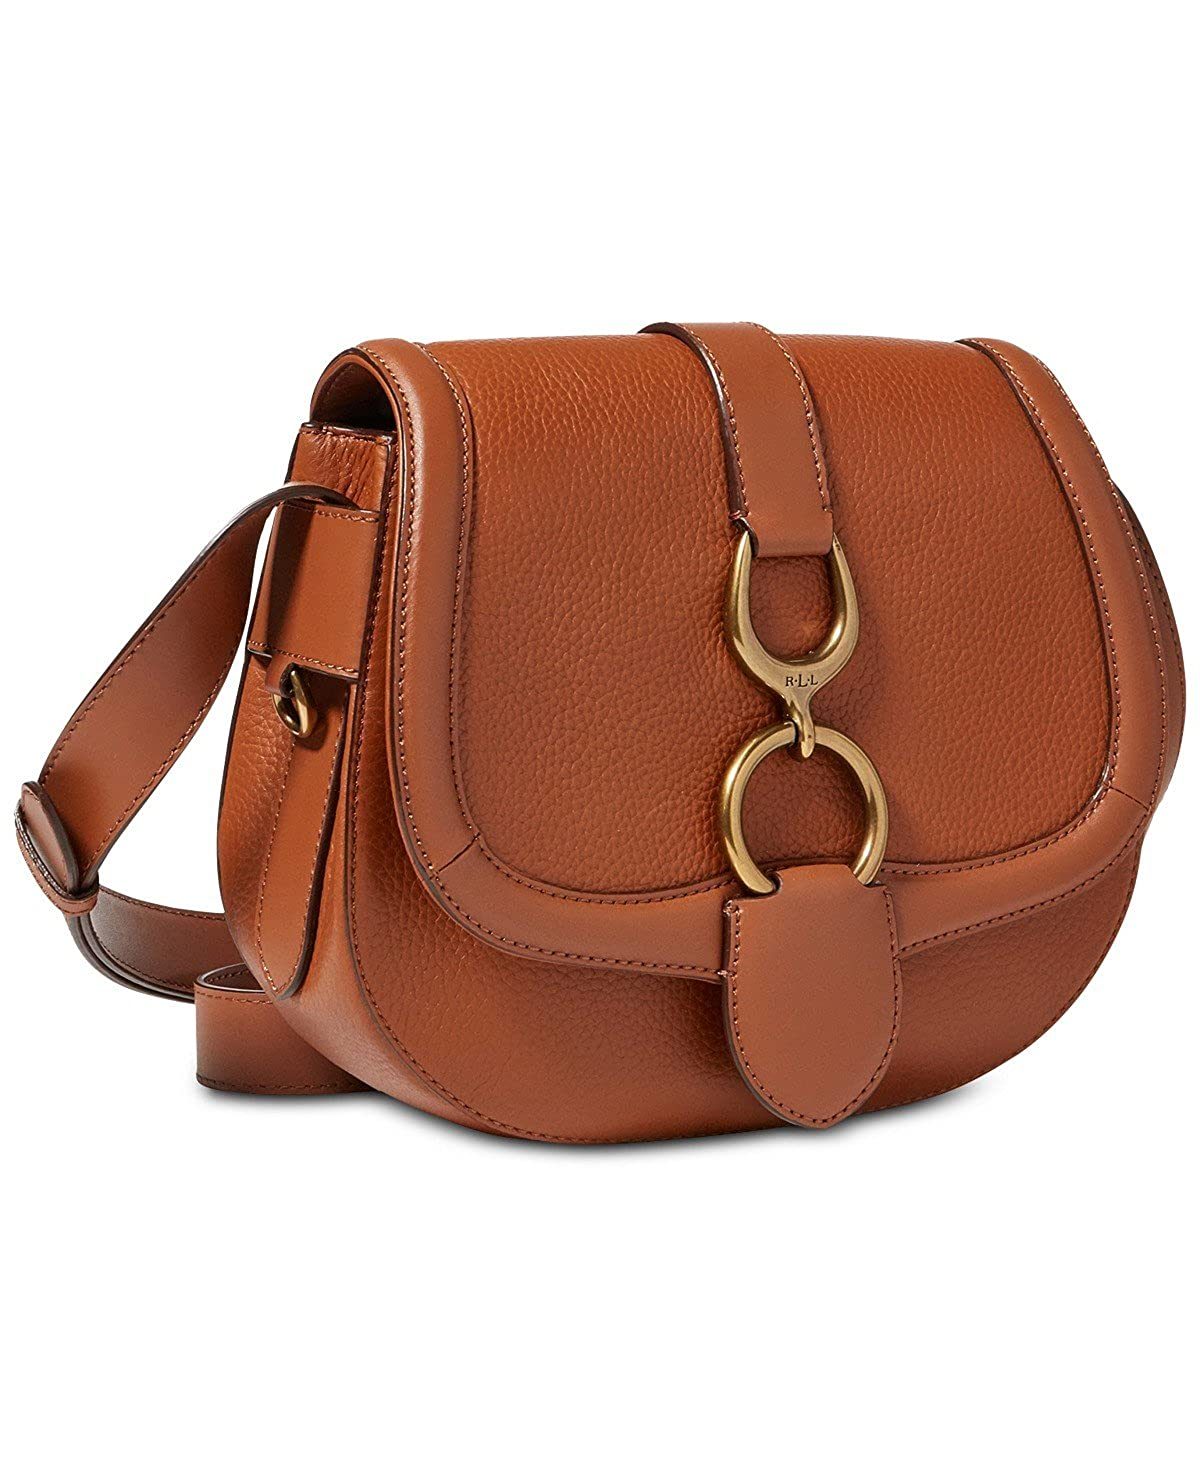 2572bc368264 Lauren Ralph Lauren Barrington Saddle Small Crossbody (Tan)  Amazon.ca   Shoes   Handbags